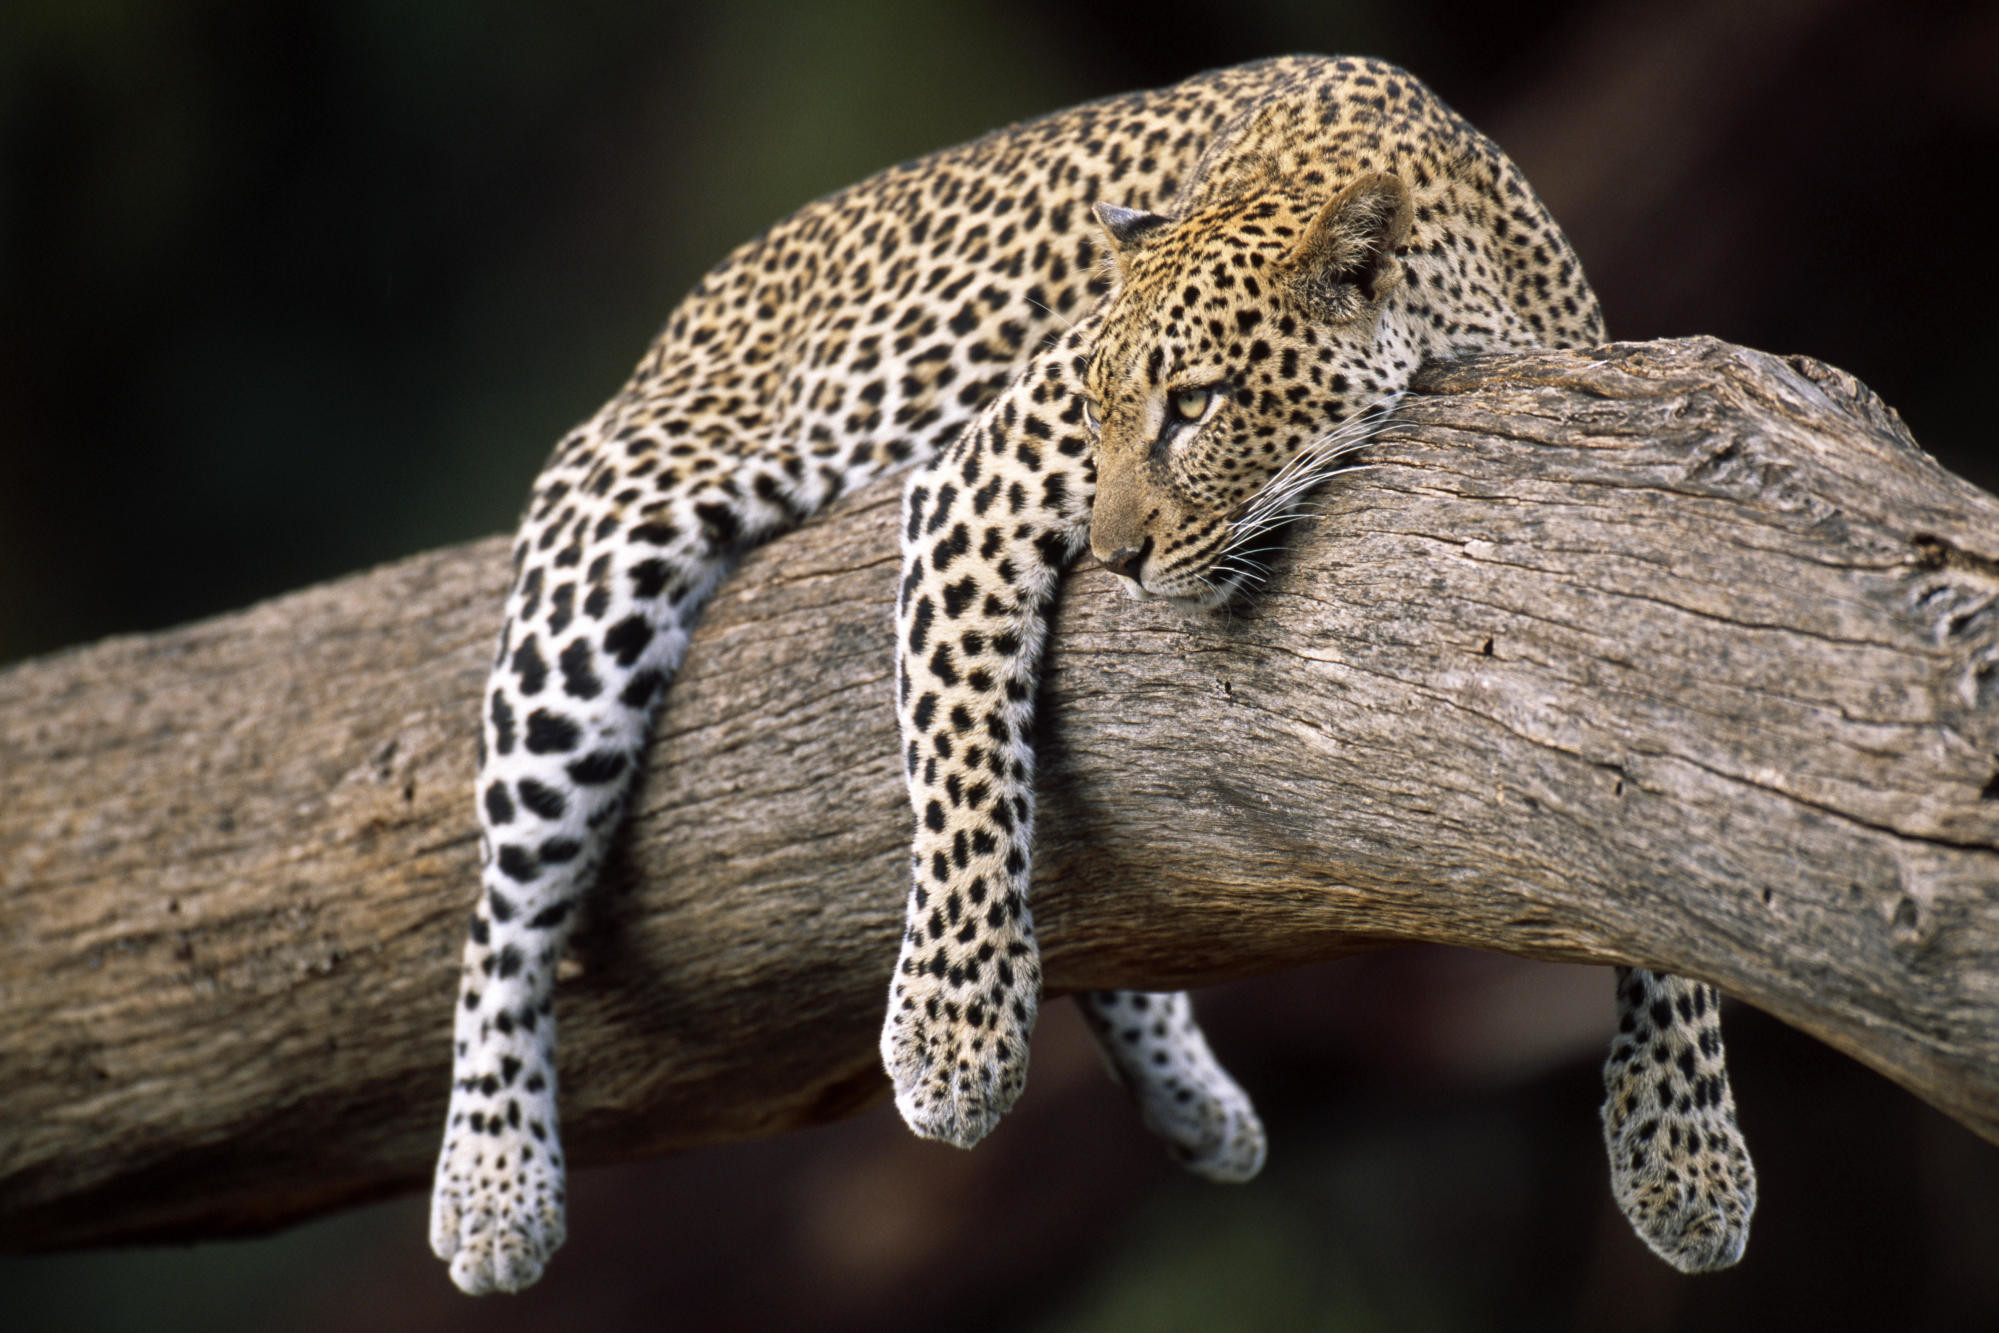 Sleeping Leopard HD Animal Wallpaper